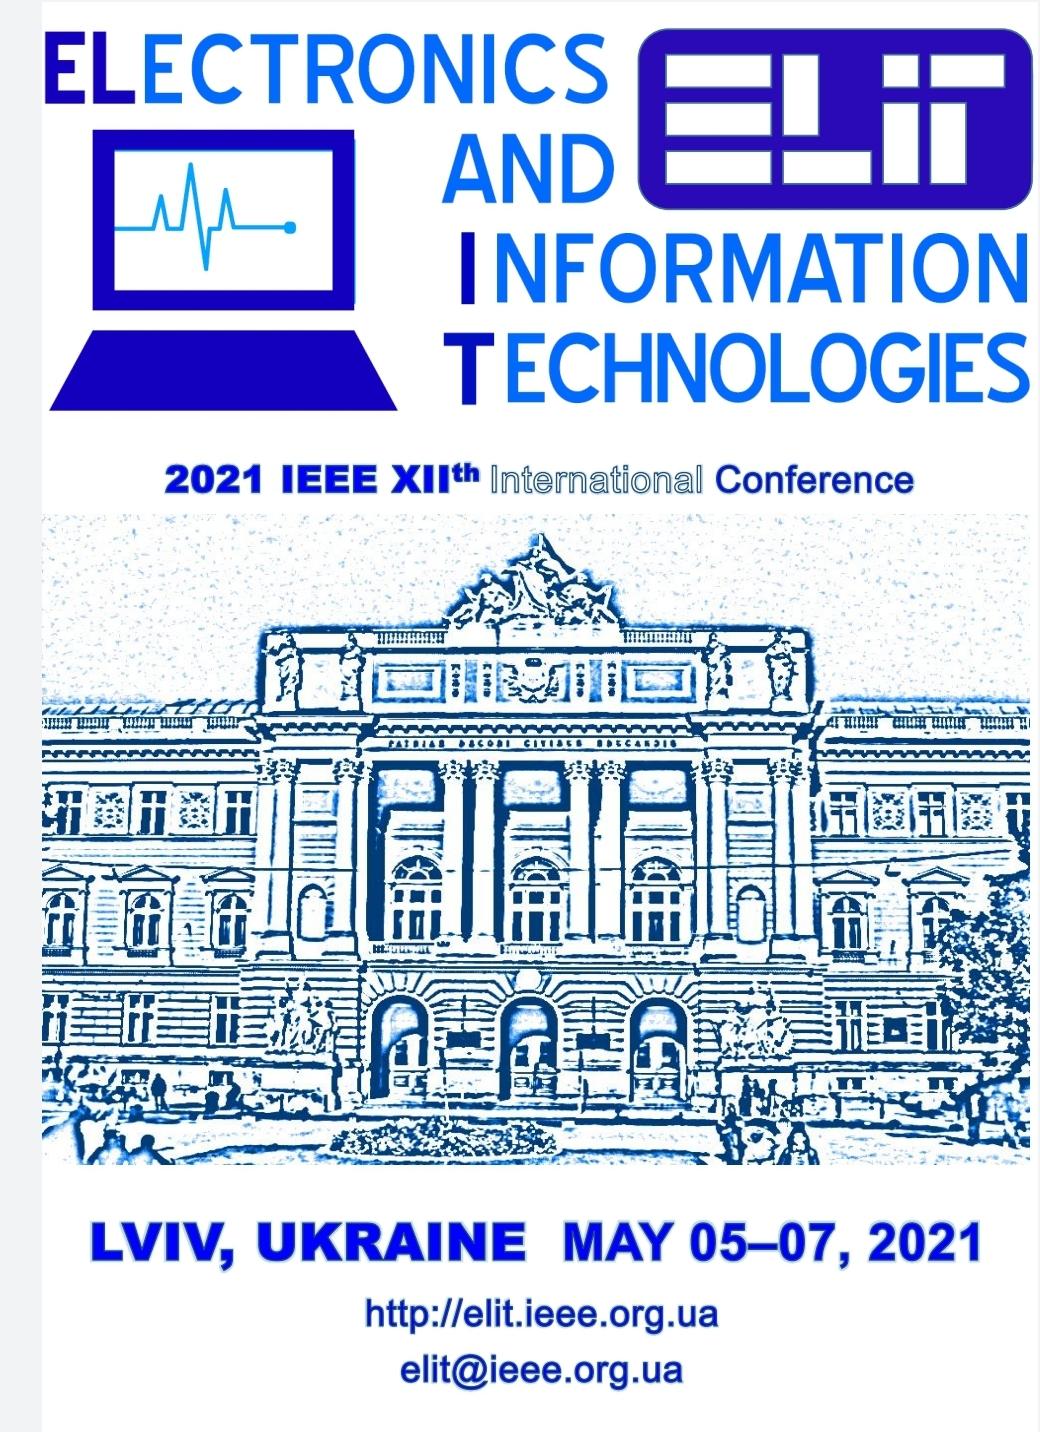 Конференція 2021 IEEE XIIth International Conference on Electronics and Information Technologies (ELIT)